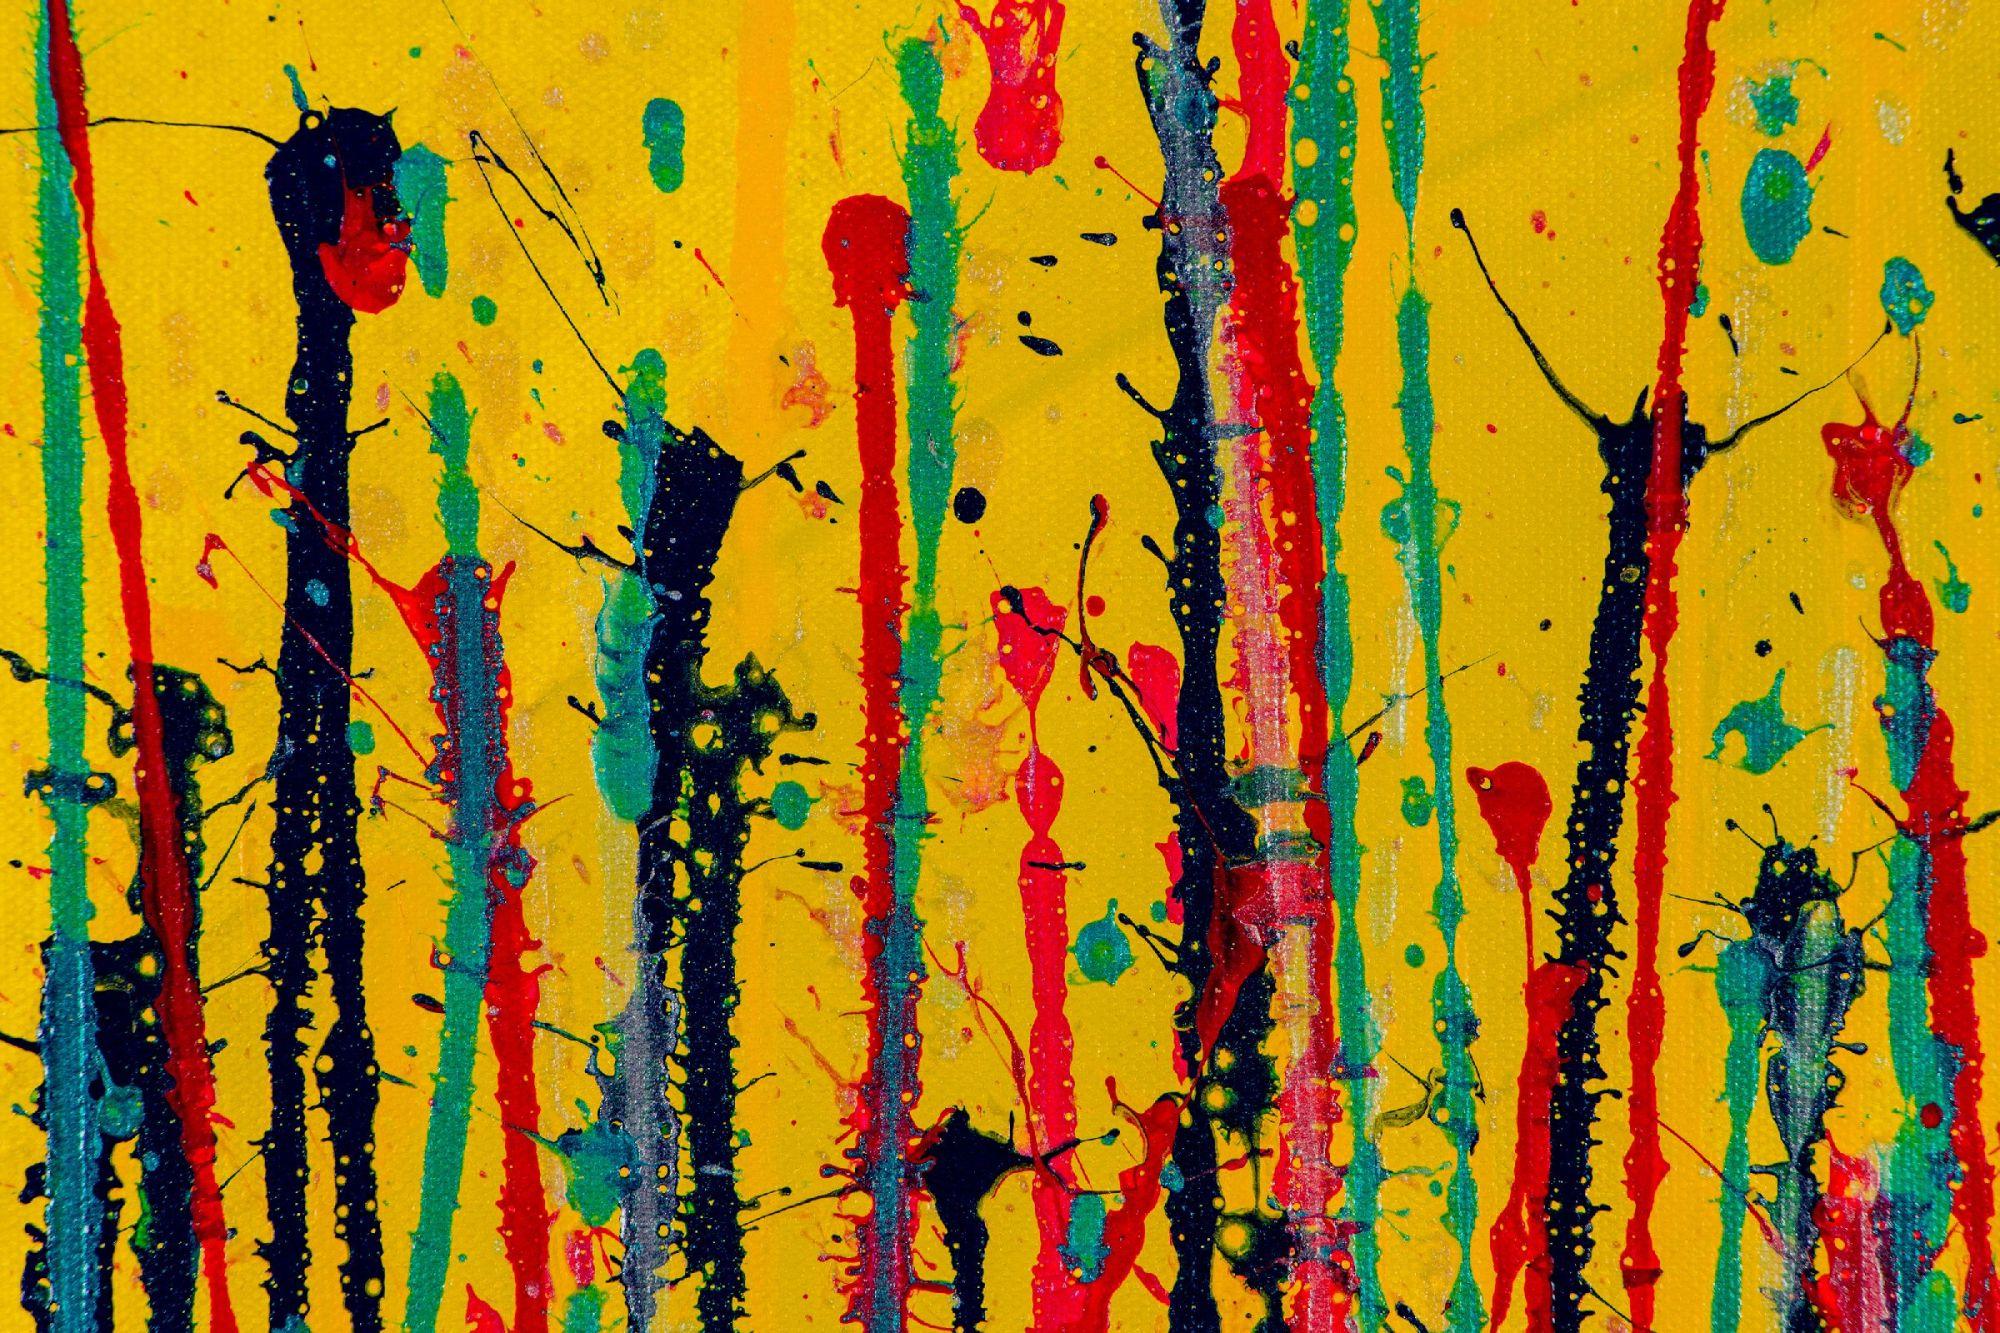 SOLD - Garden In Motion 6 (2020) by Nestor Toro